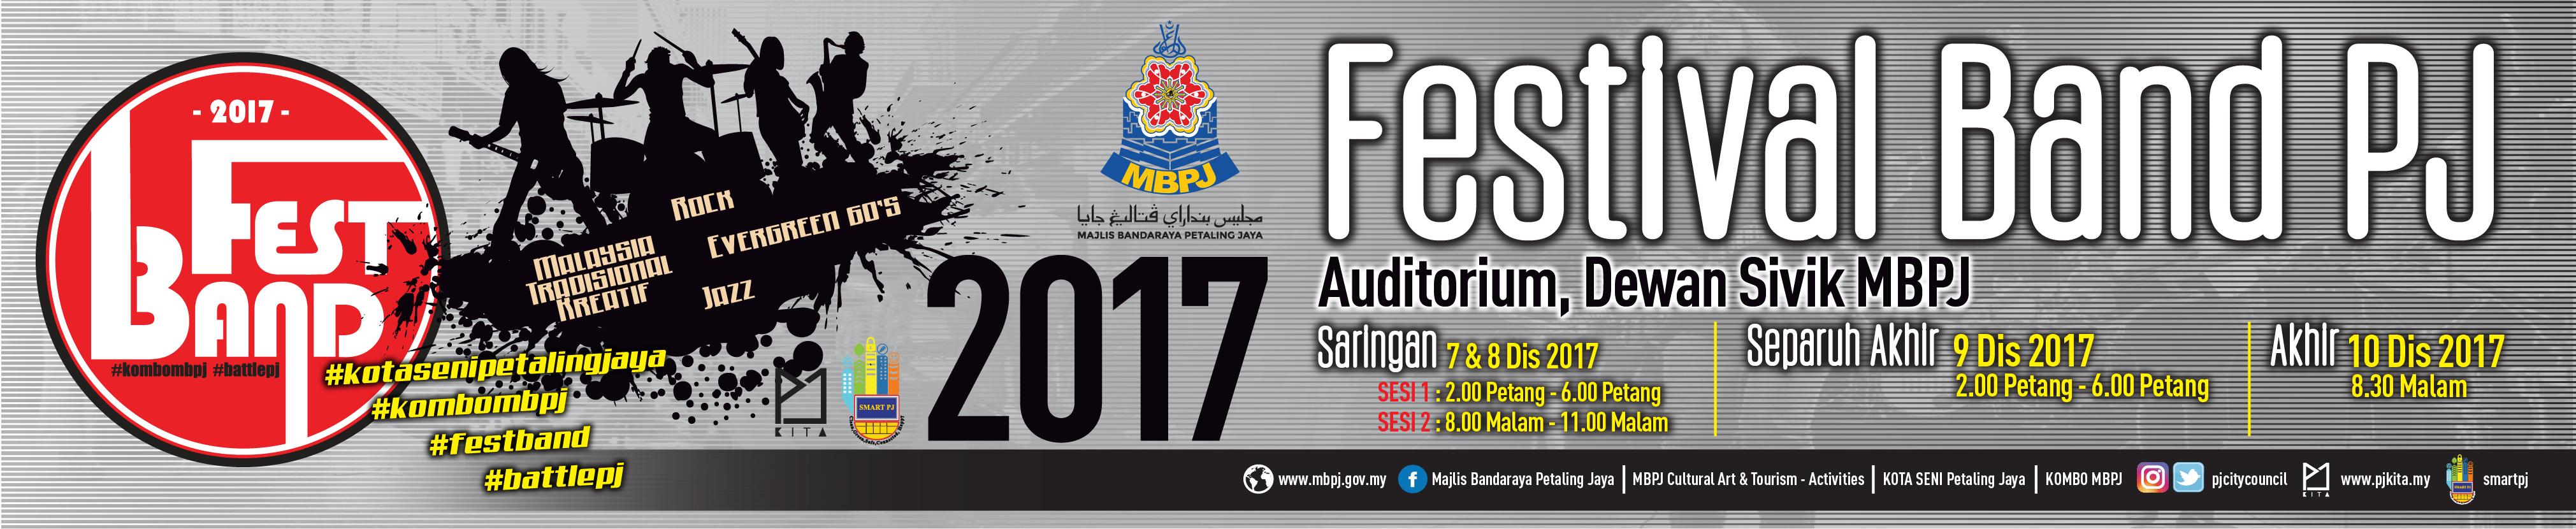 Banner FestBand PJ 2017